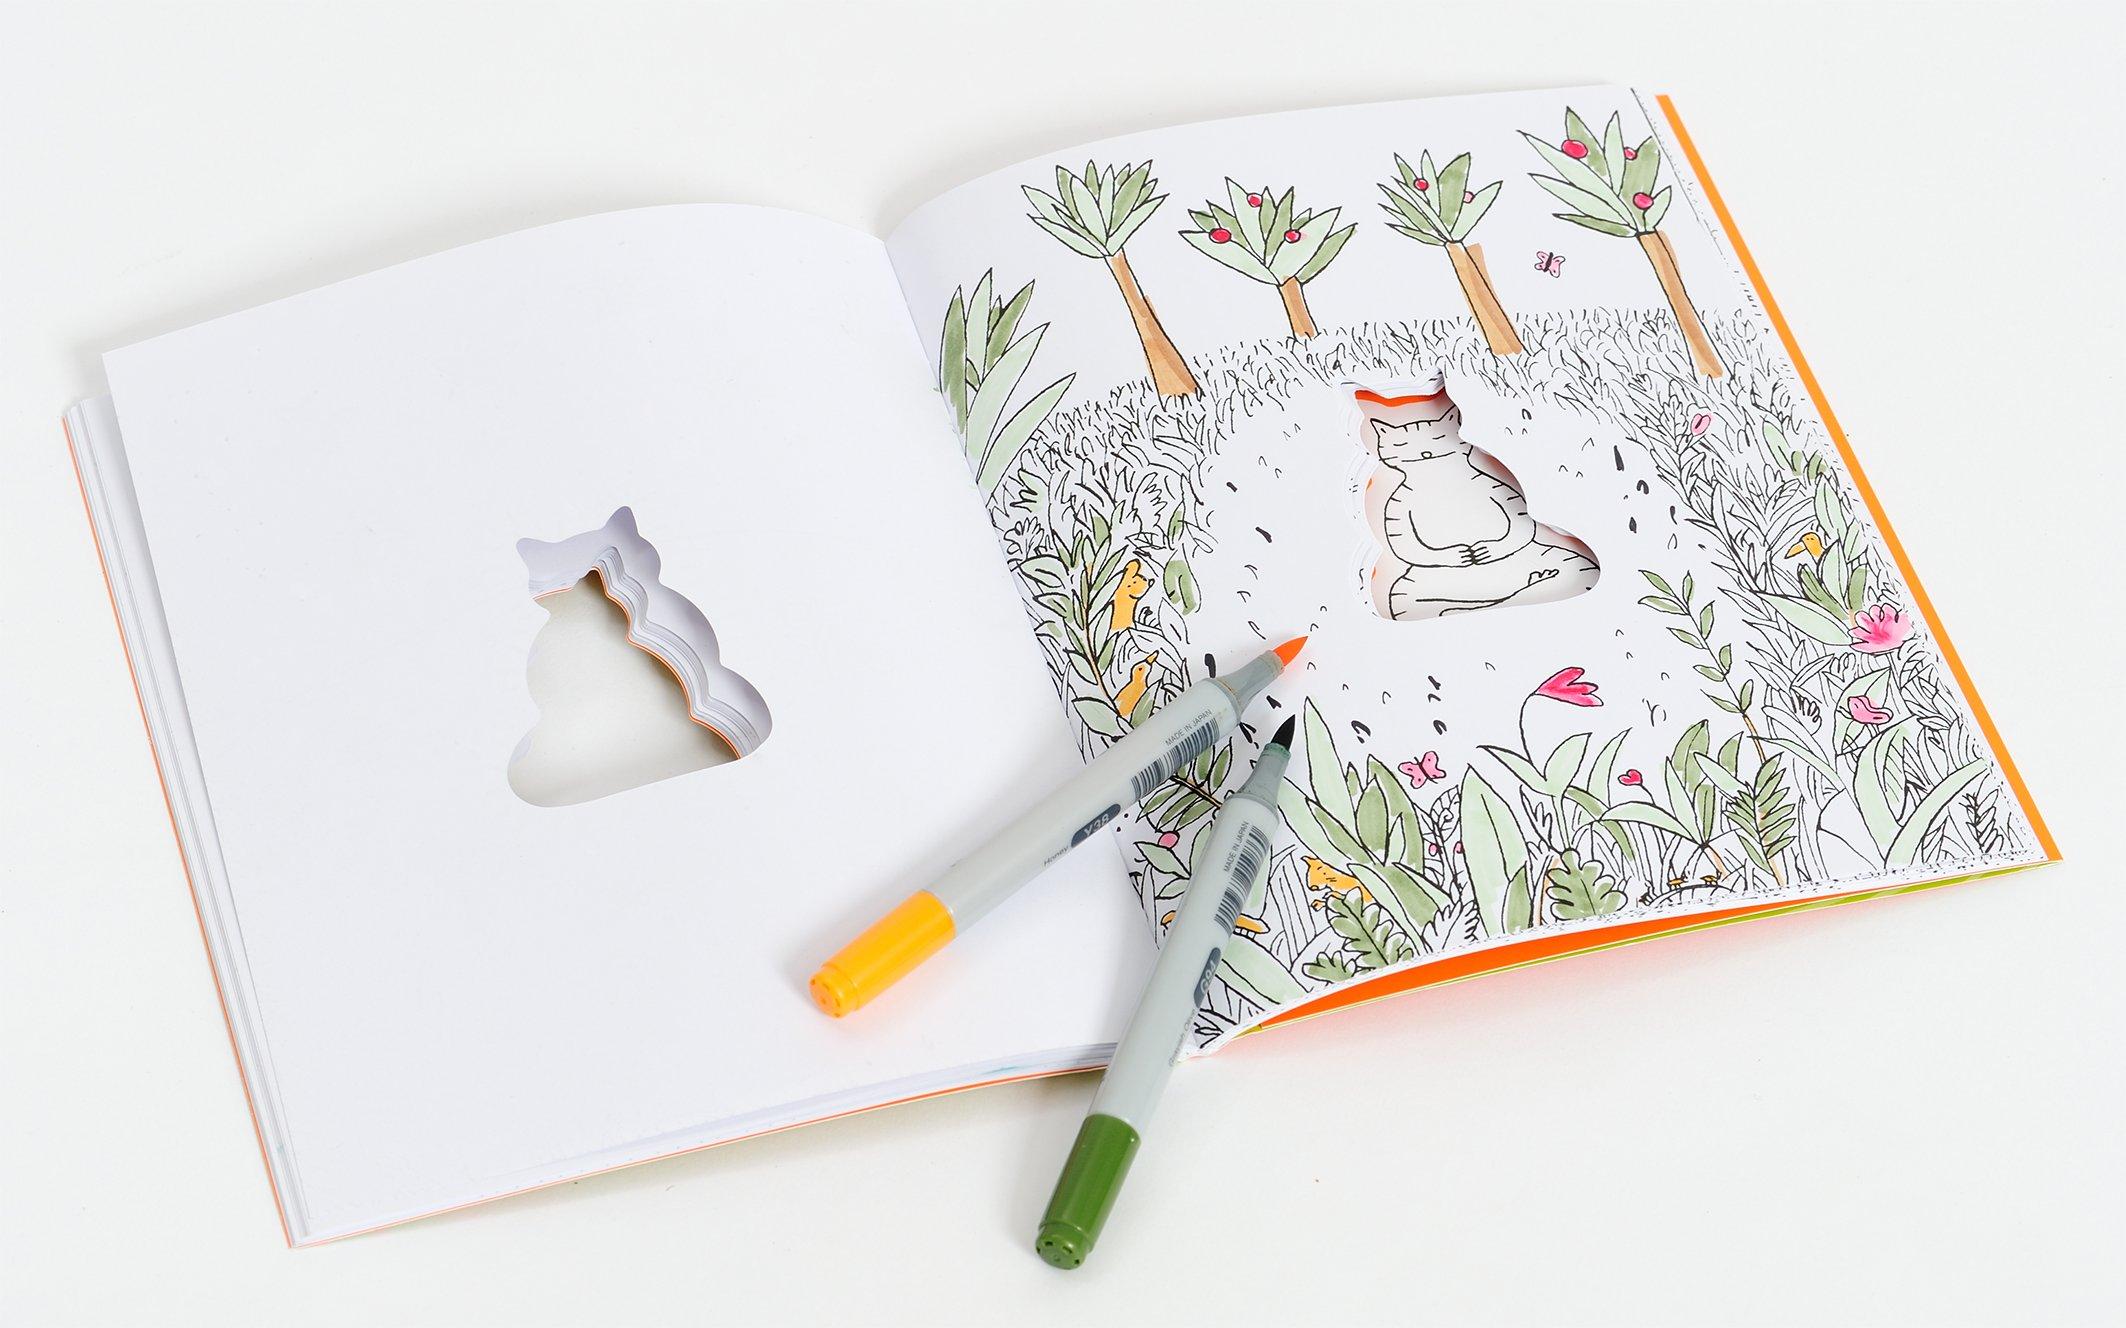 Kat-Zen: Das meditative Malbuch: Amazon.de: Jean-Vincent Sénac: Bücher